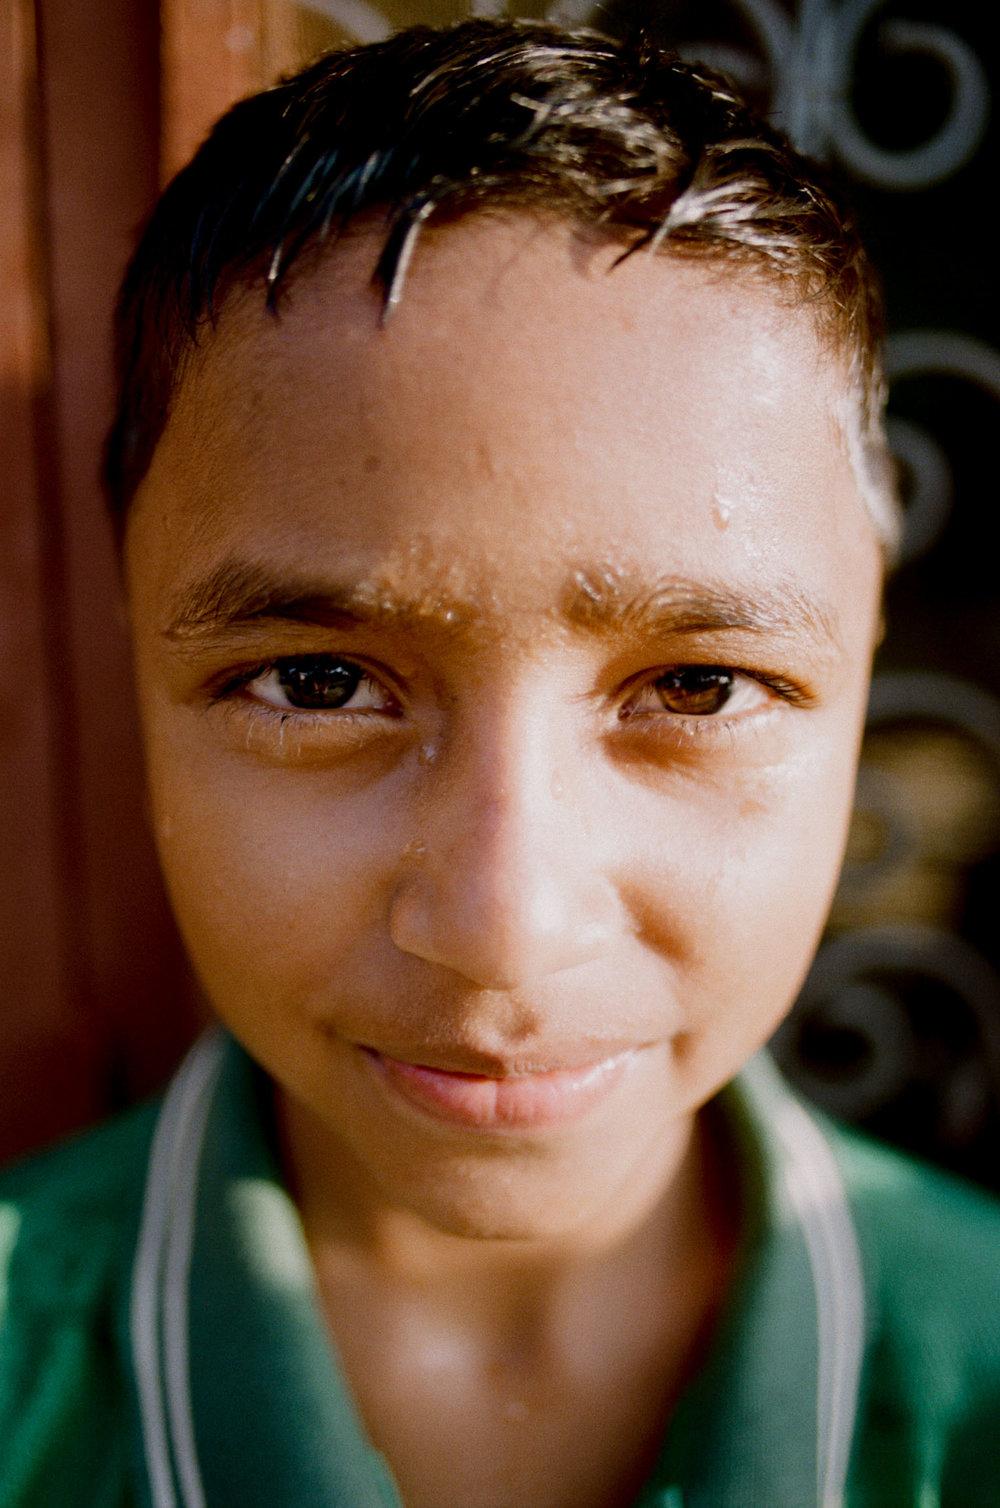 21392_JRE_Nepal_009-01site.jpg